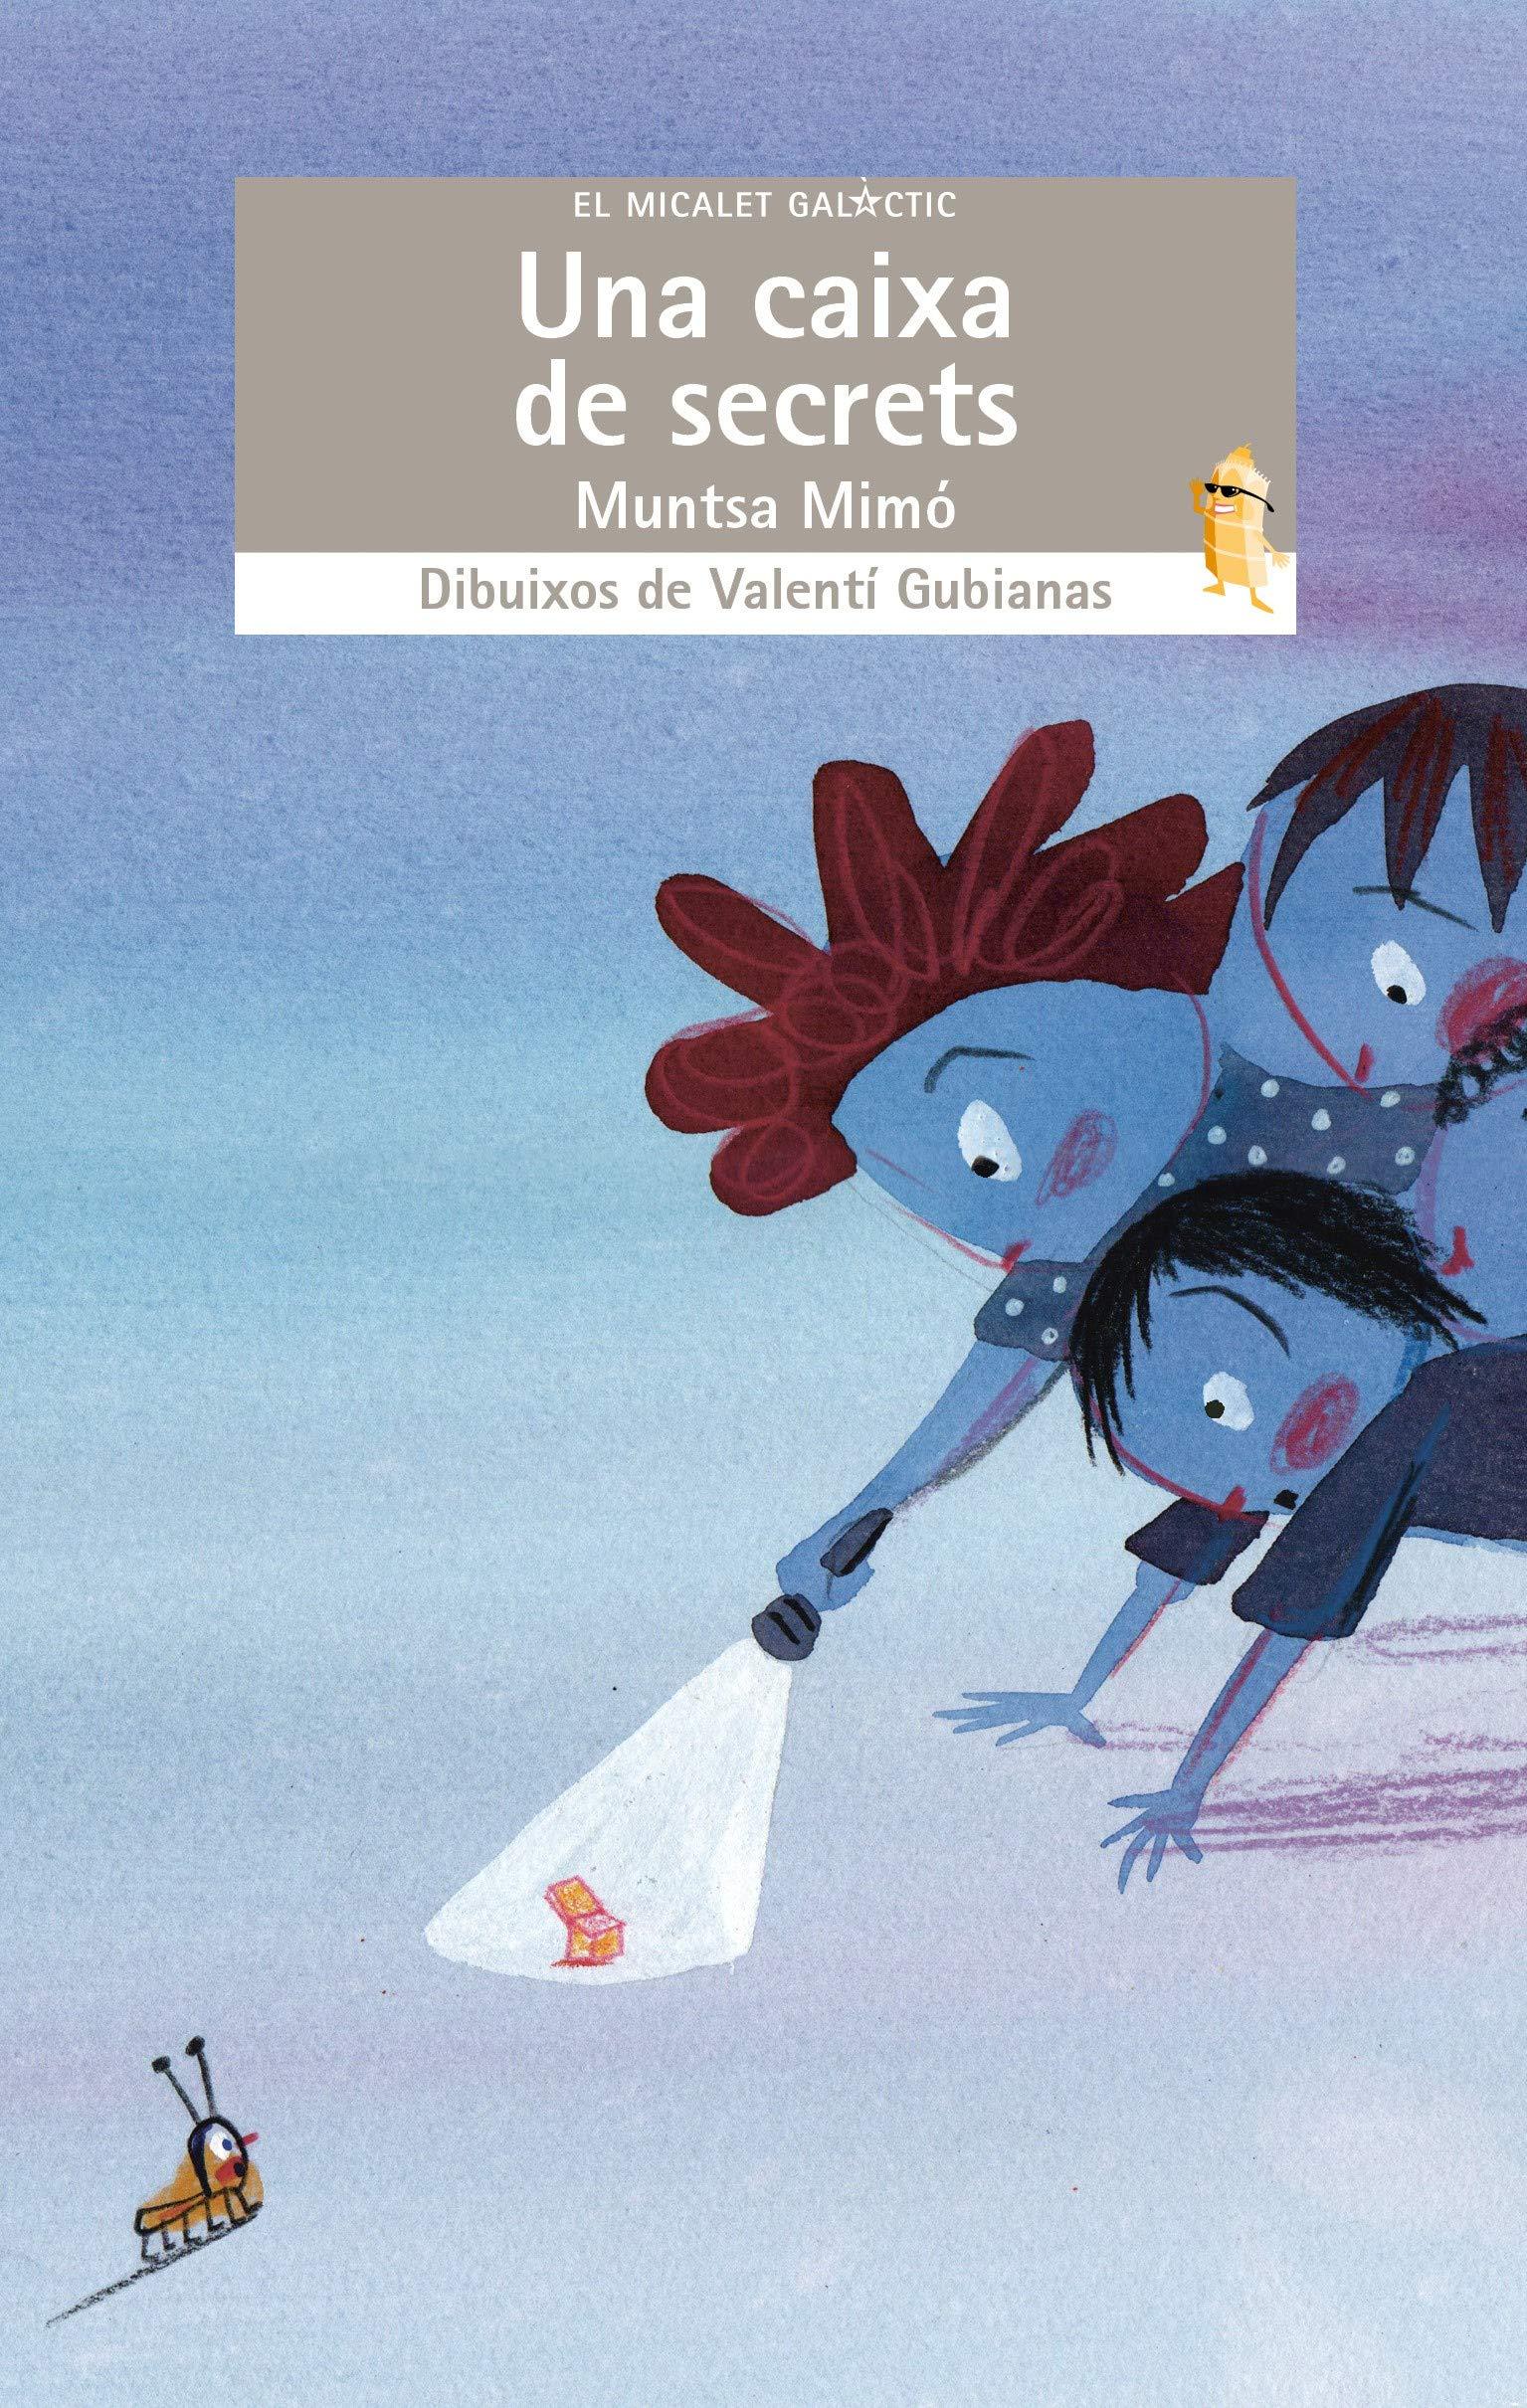 Una caixa de secrets: 227 (El Micalet Galàctic): Amazon.es: Muntsa Mimó, Gubianas Escudé, Valentí: Libros